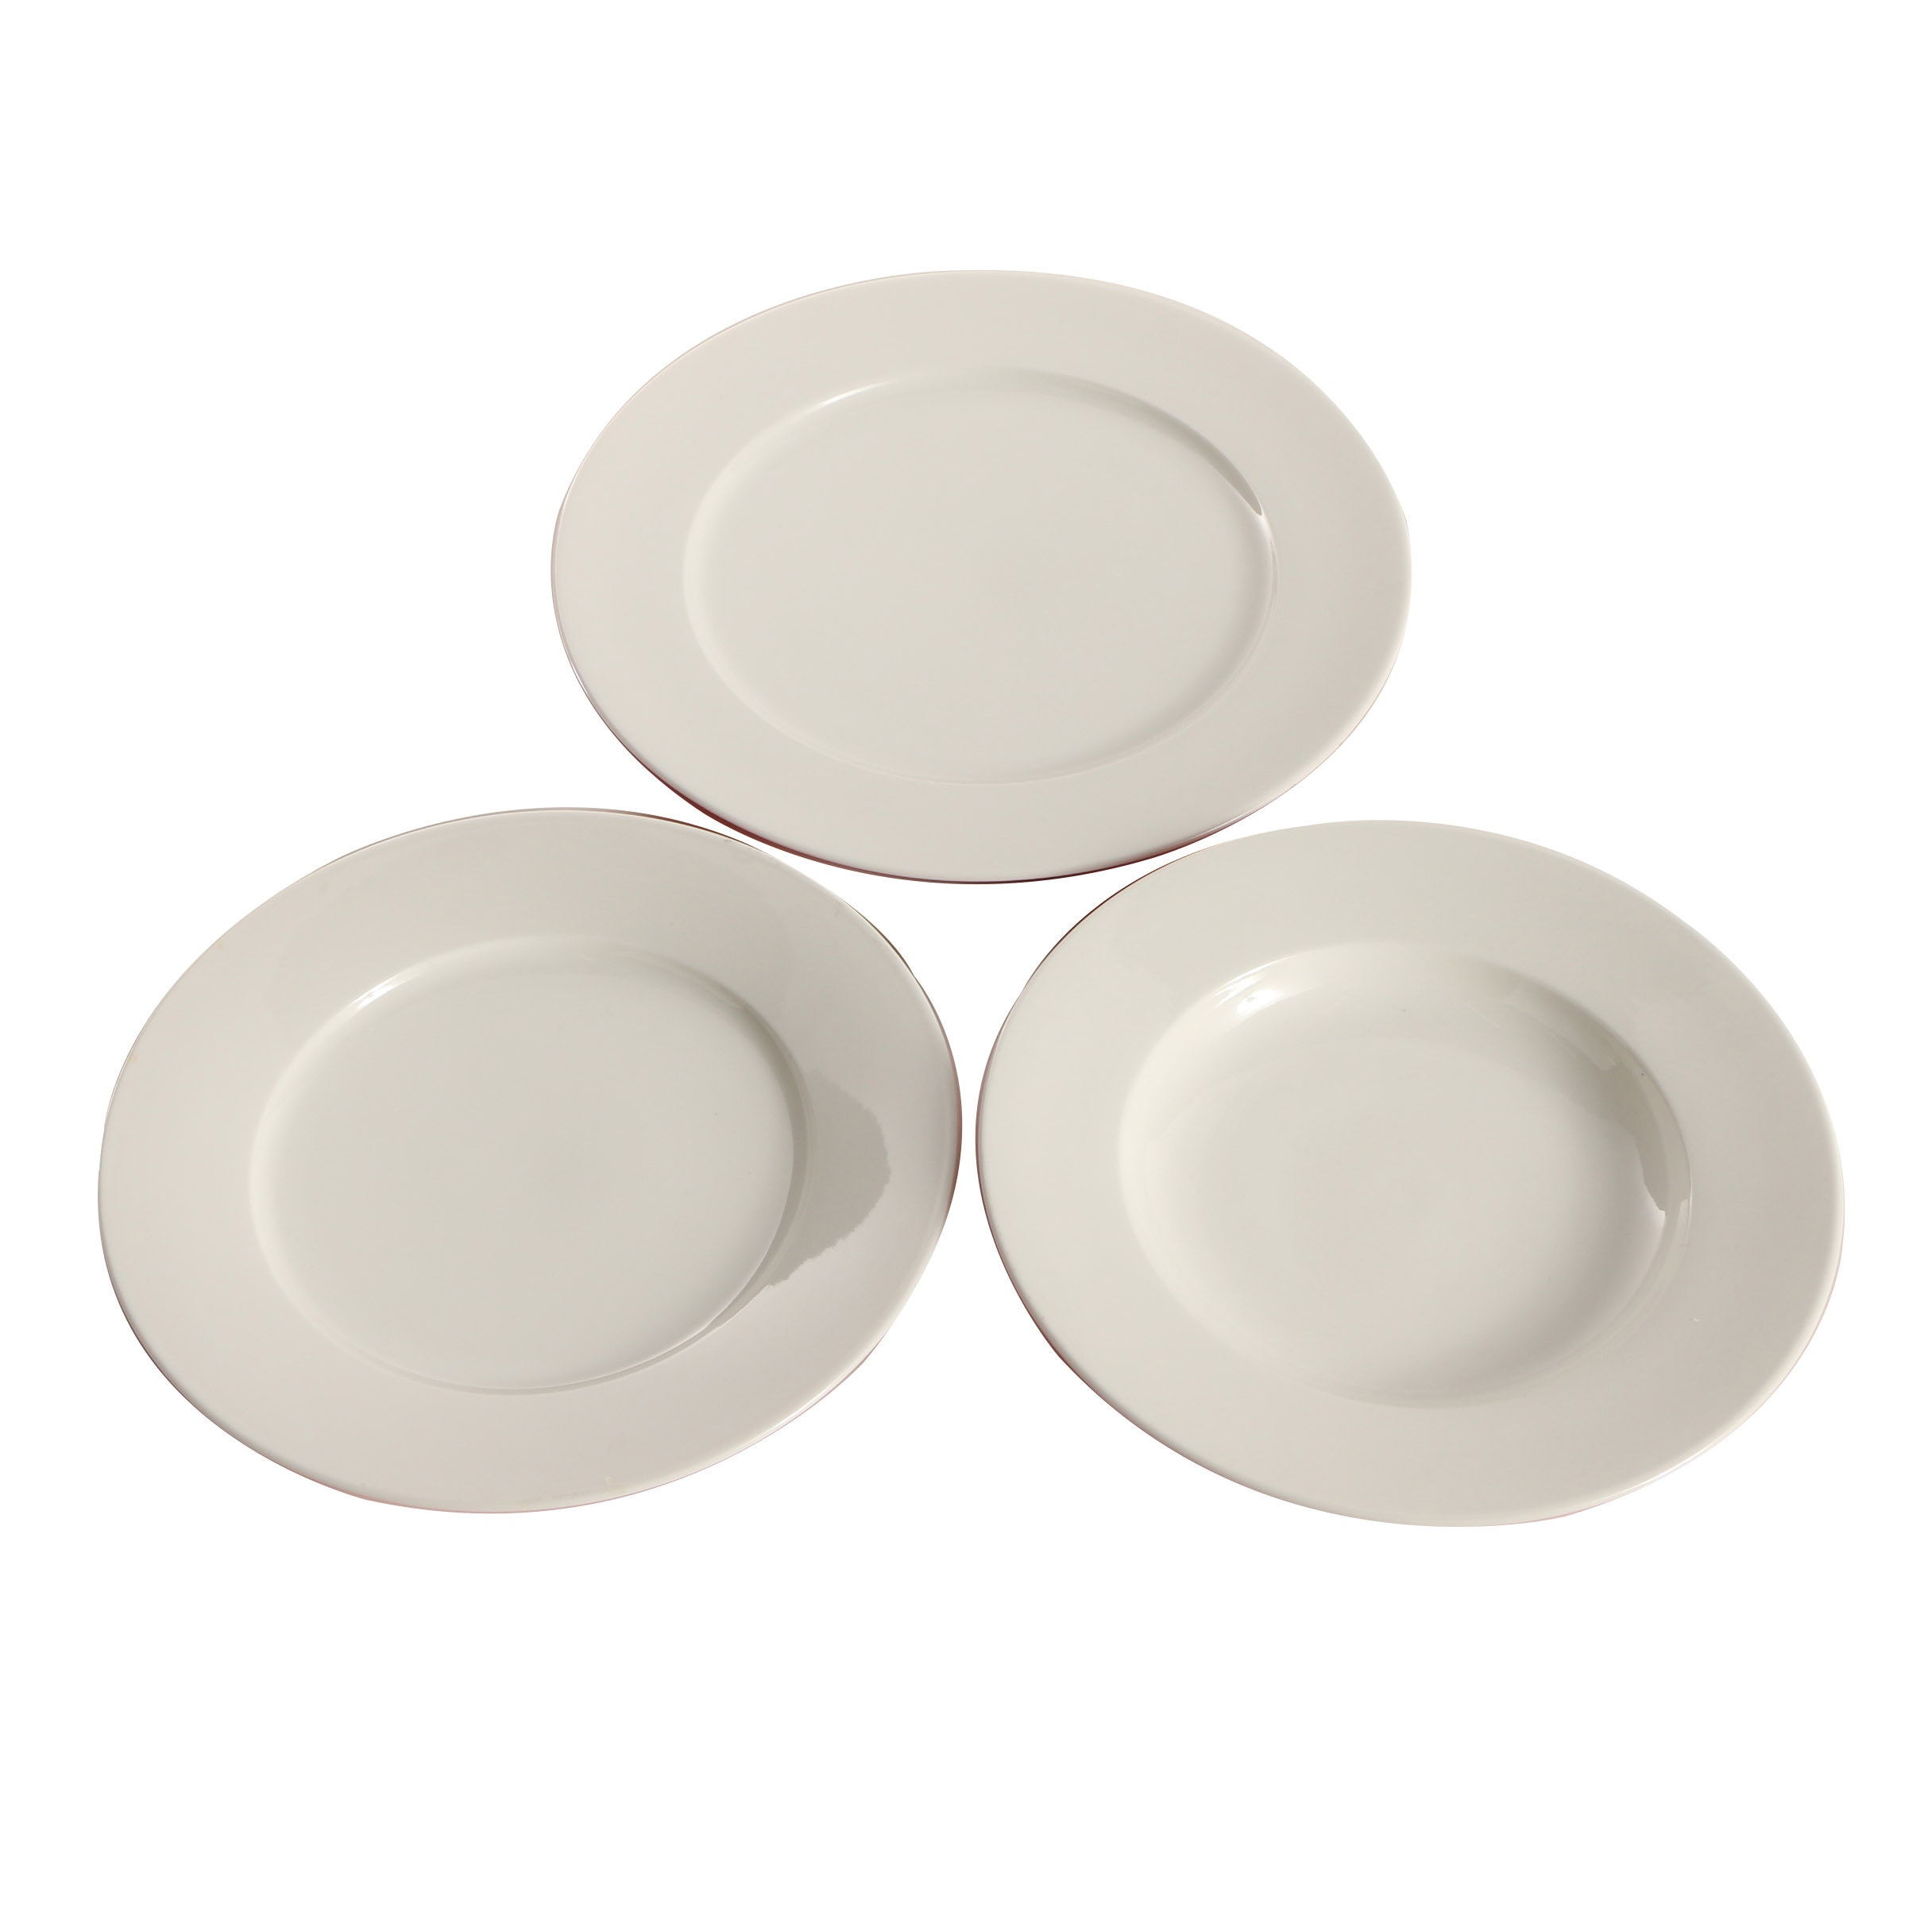 "Oscar Tusquets Blanca ""Victoria"" Porcelain Dinnerware"